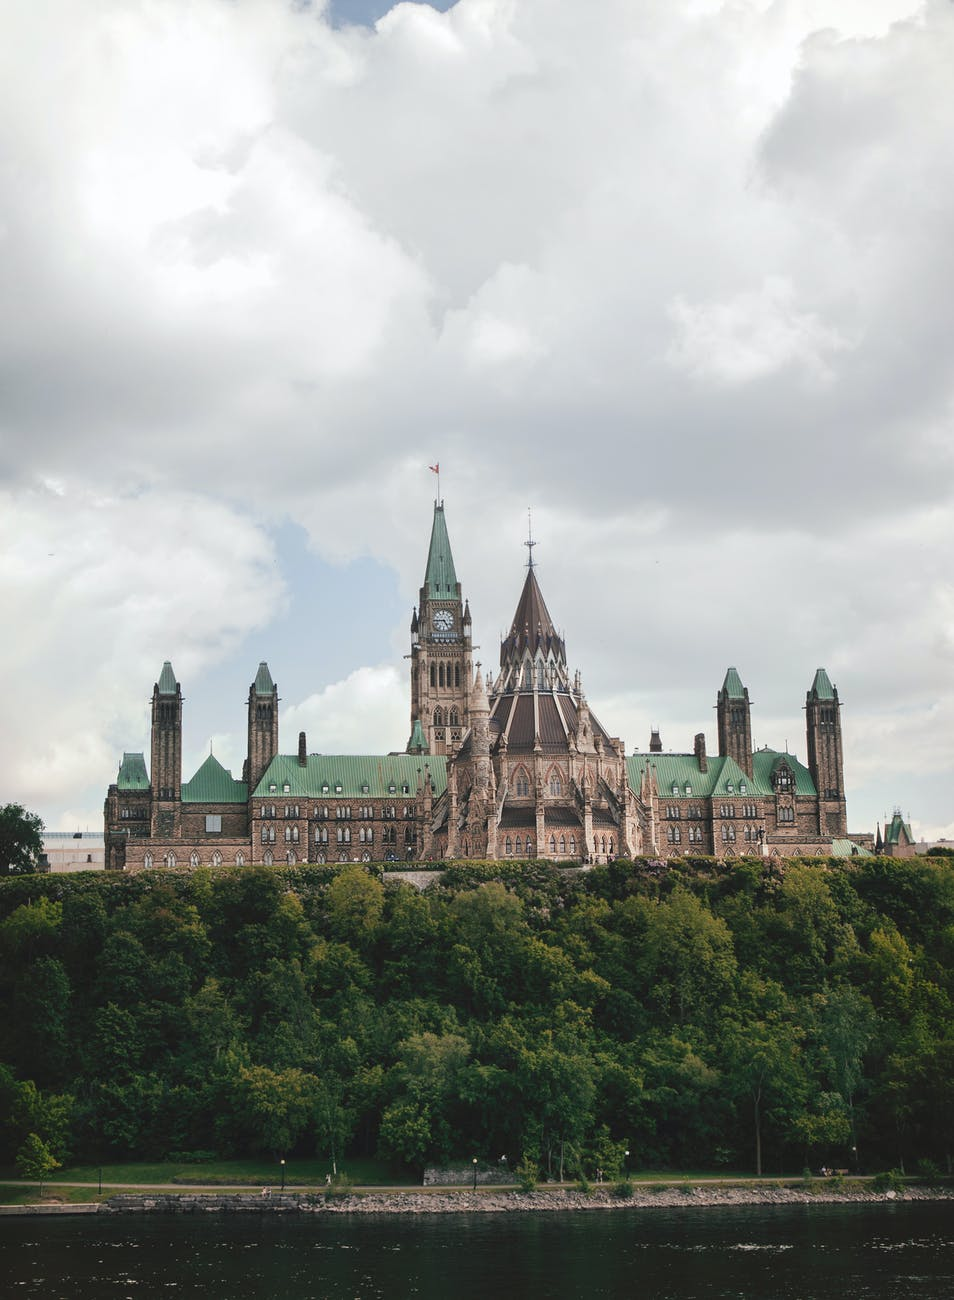 tour-canadas-parliament-buildings